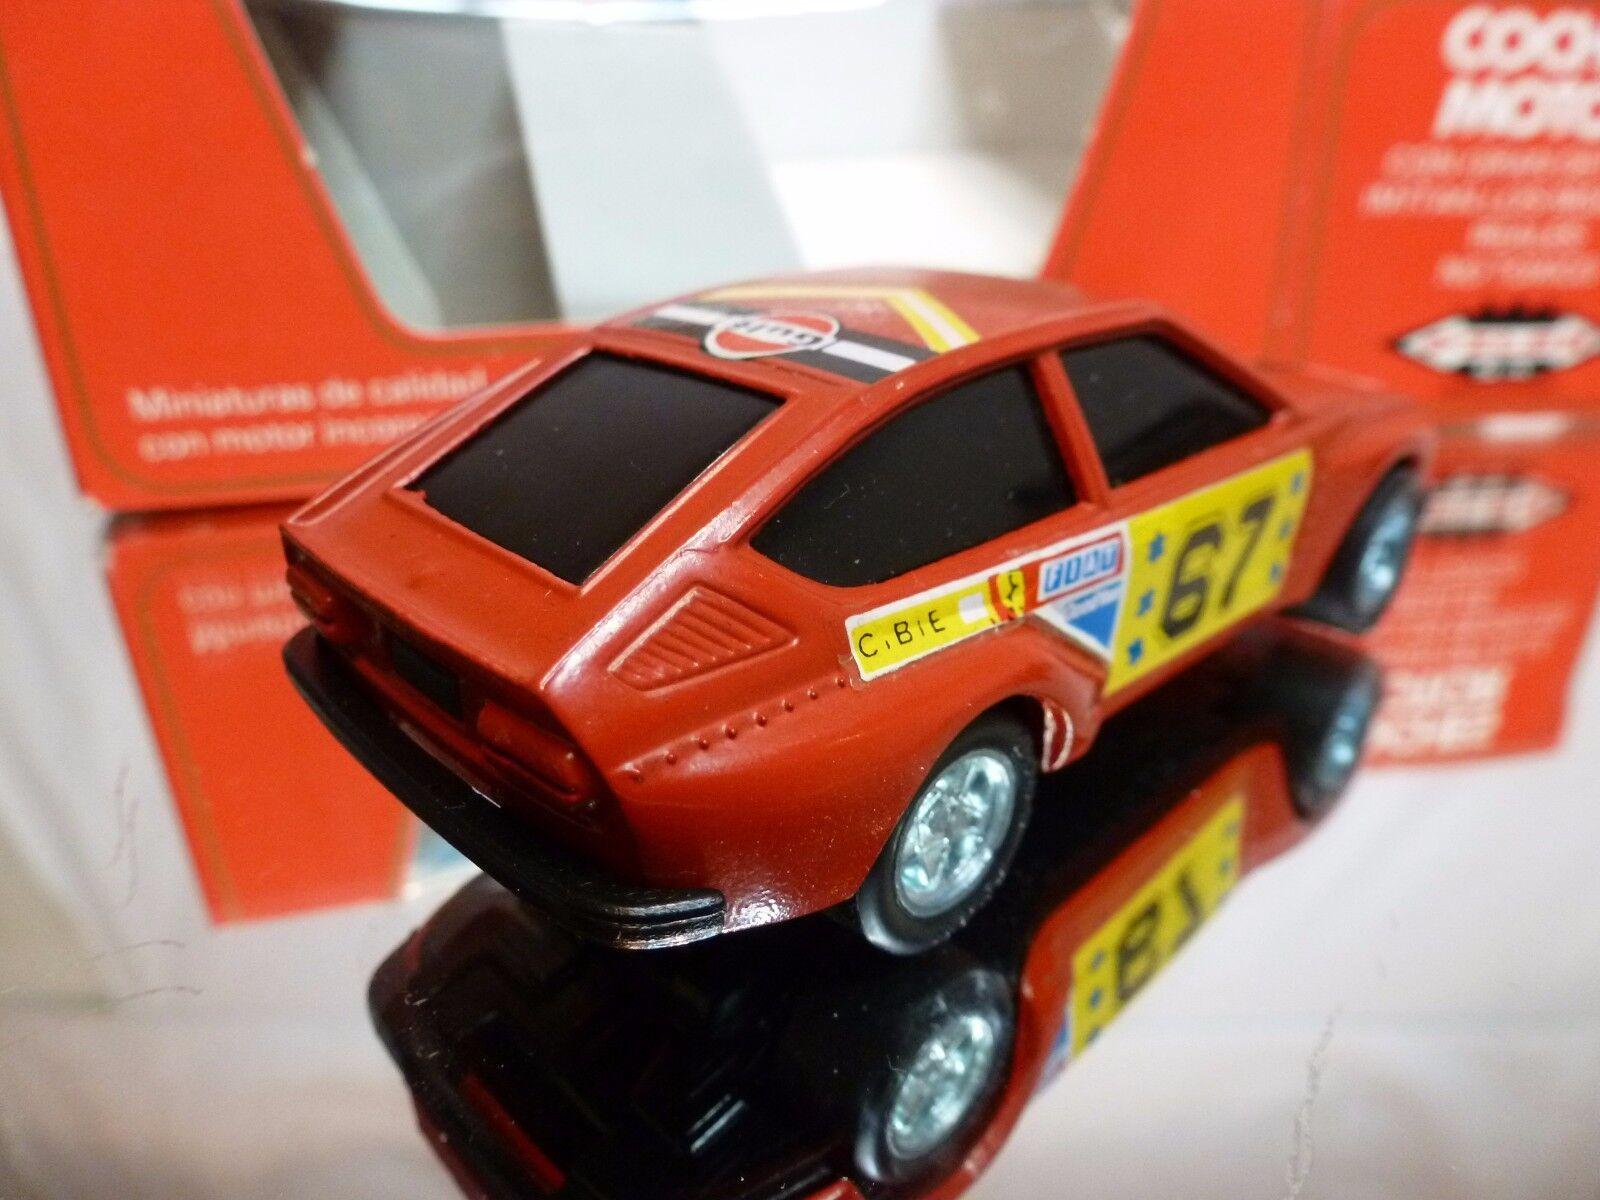 PILEN 253 ALFA ALFA ALFA ROMEO ALFETTA GTV 2000 - TEXACO GULF - RED 1 43 -VERY GOOD IN BOX dc50fe